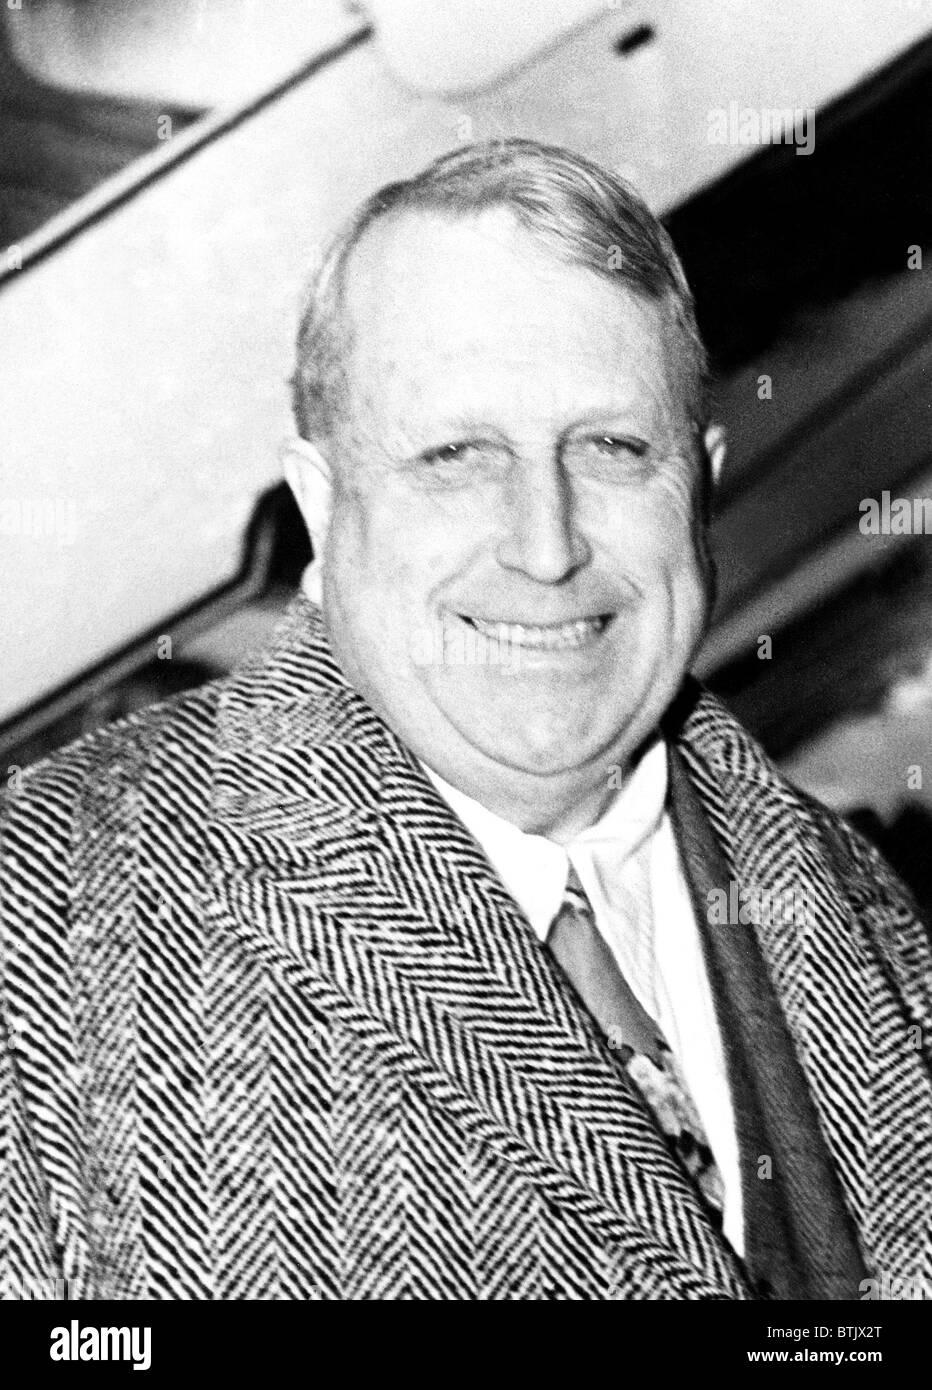 William Randolph Hearst 1937 Stock Photo Alamy